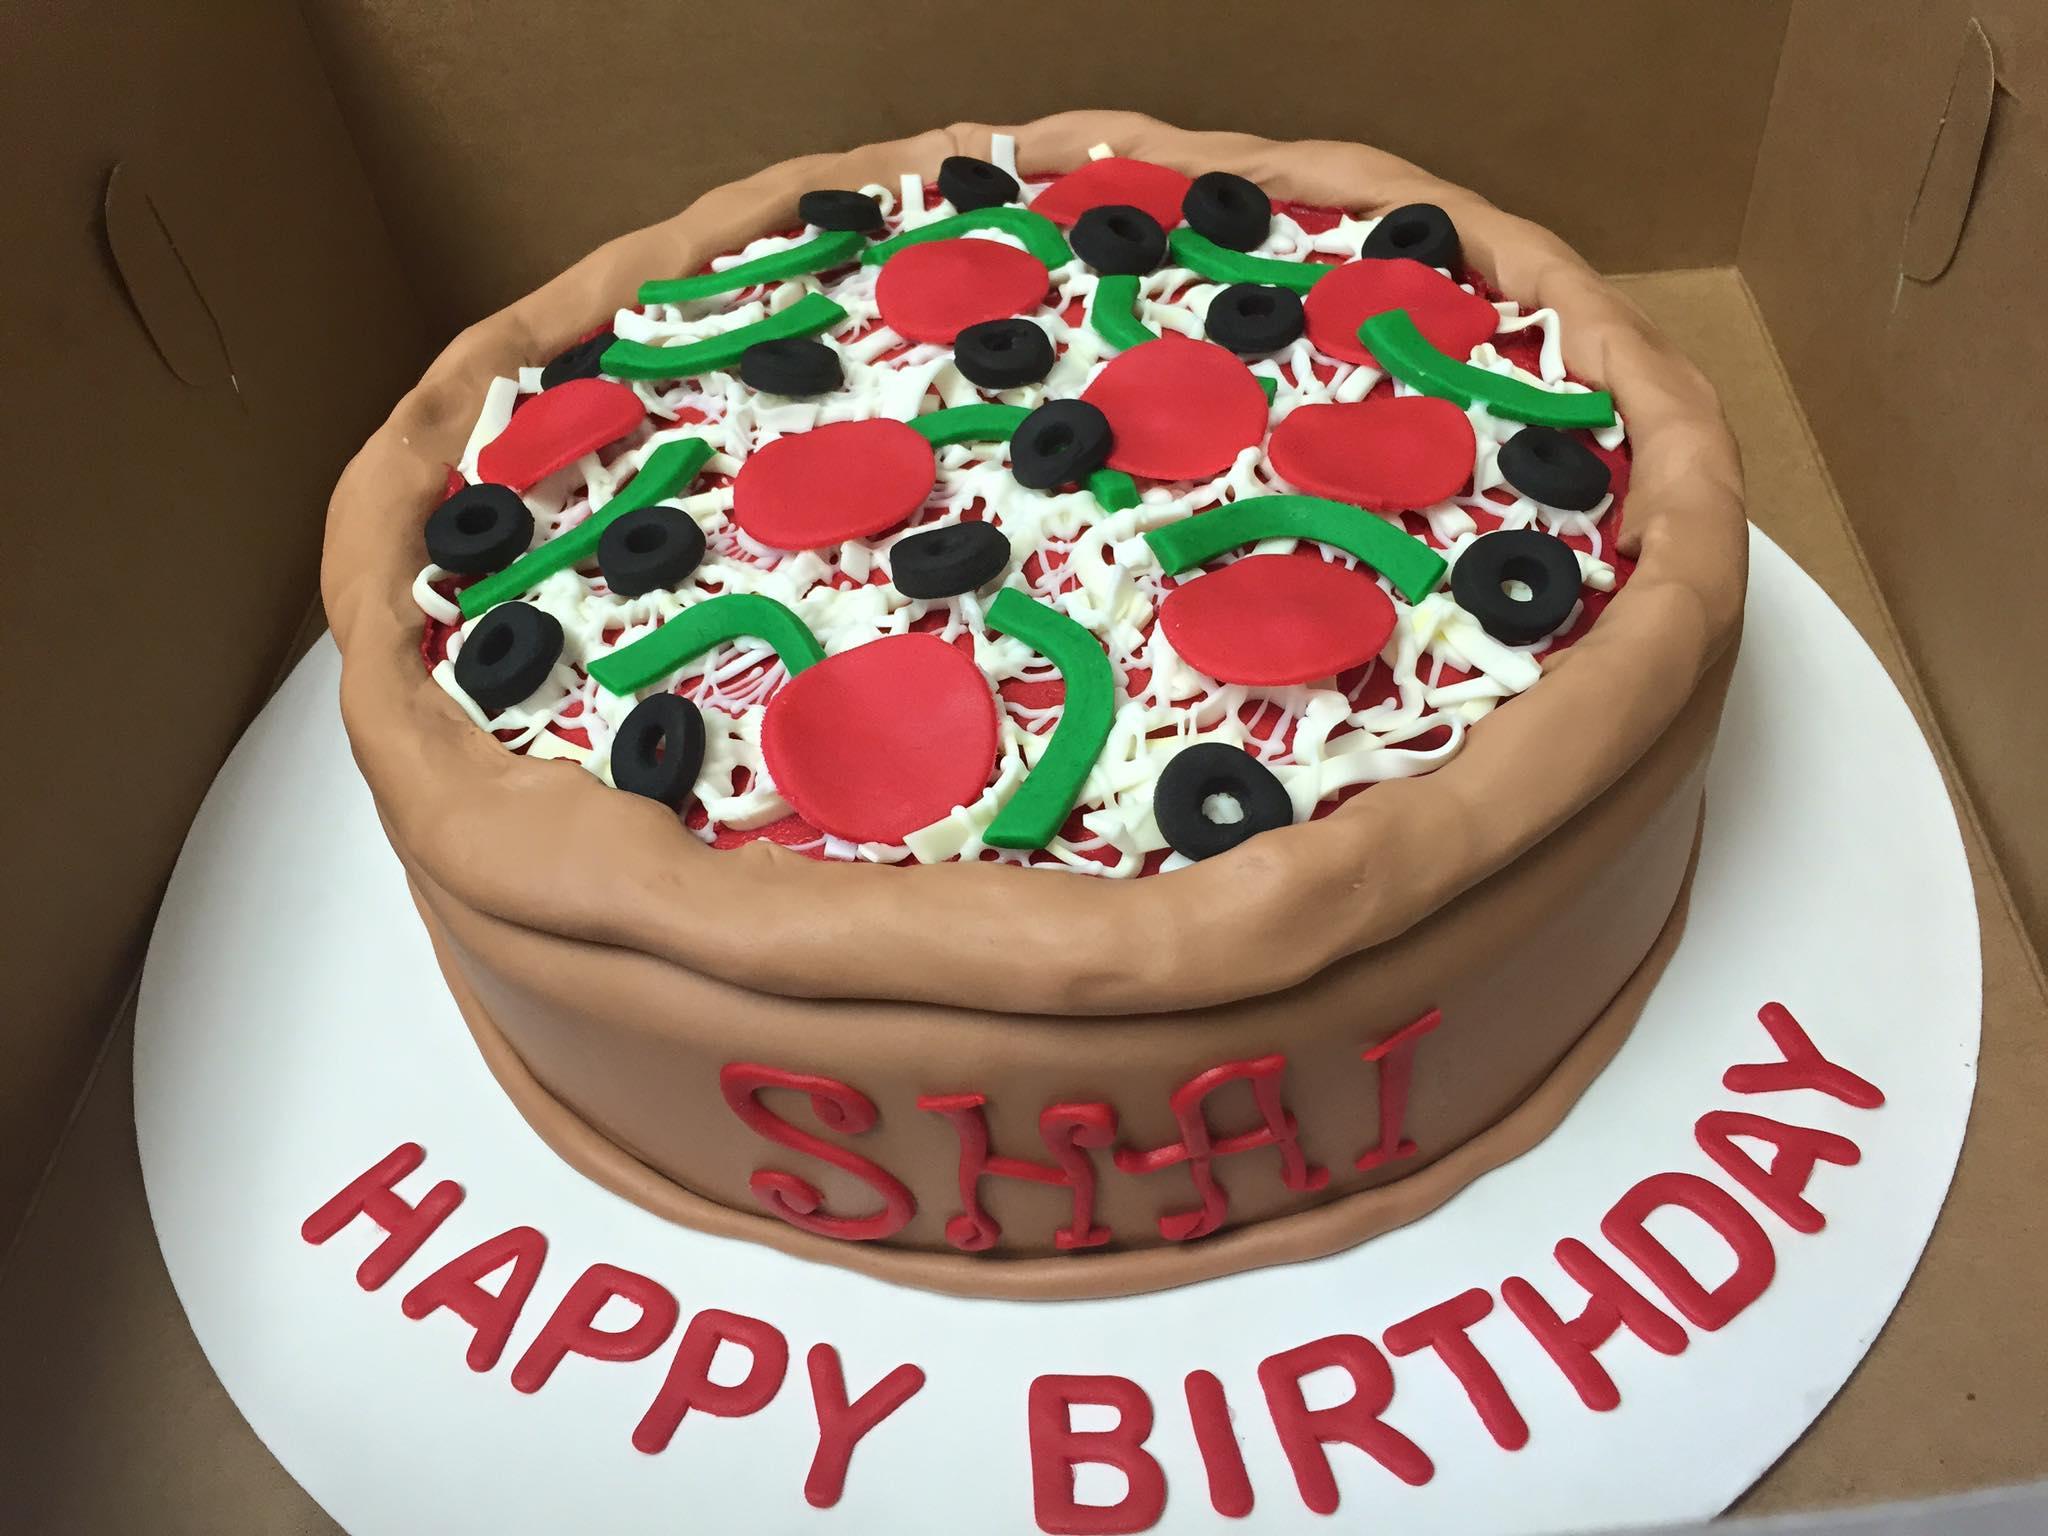 Ninja Turtles Pizza Cake – Cherish the Cakes